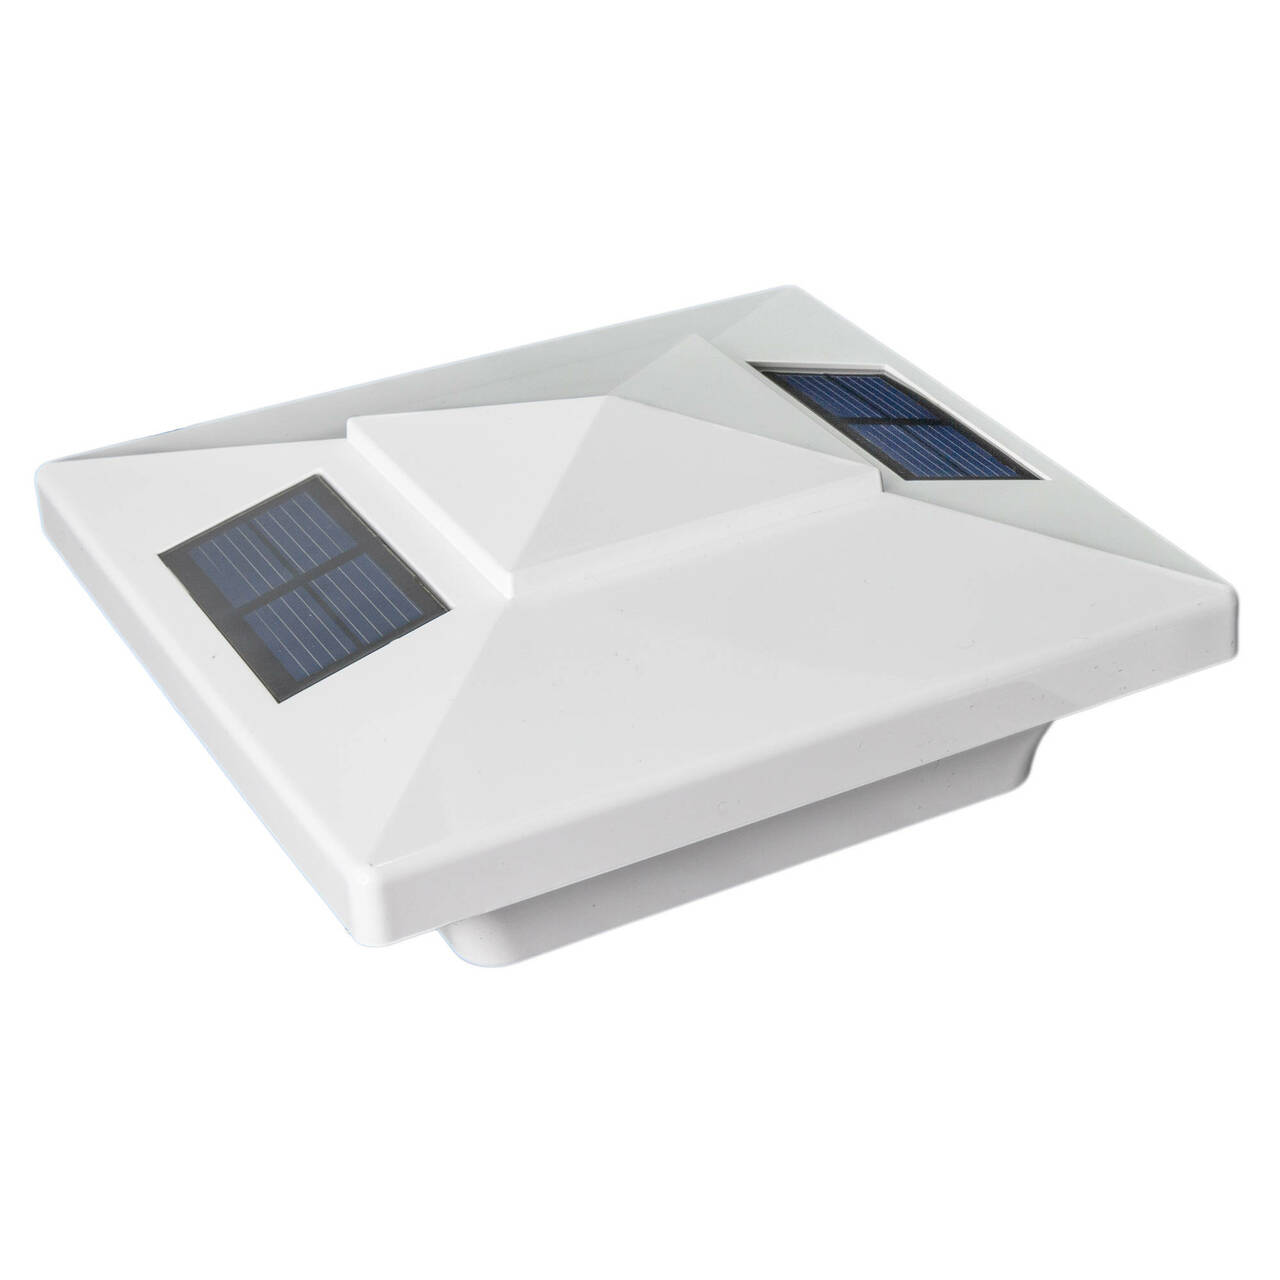 Classy Caps Windsor 4x4 White PVC Solar Post Cap